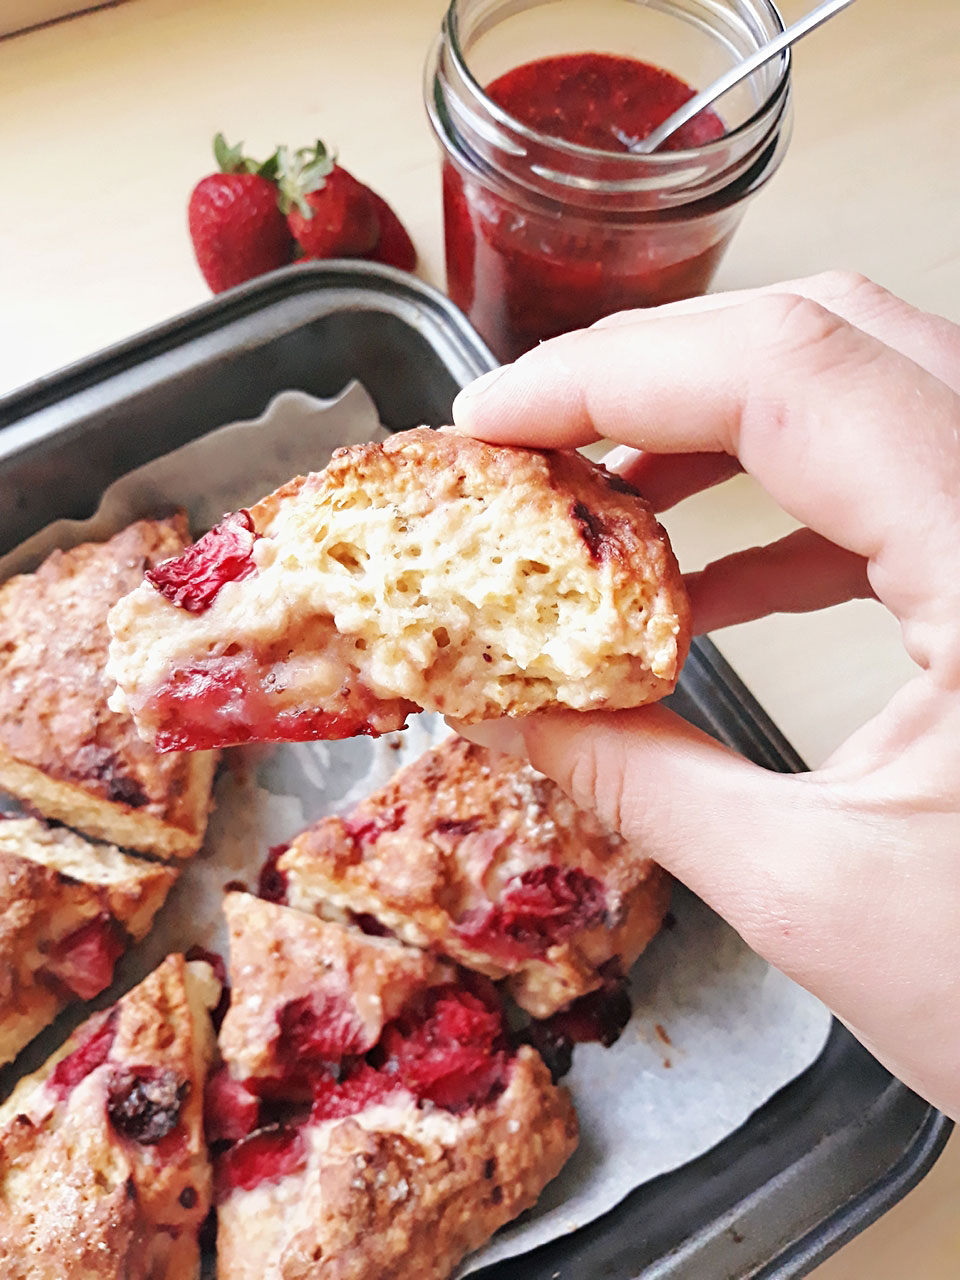 Vegan-strawberry-lemon-scones-with-chia-jam-michaela-zakova